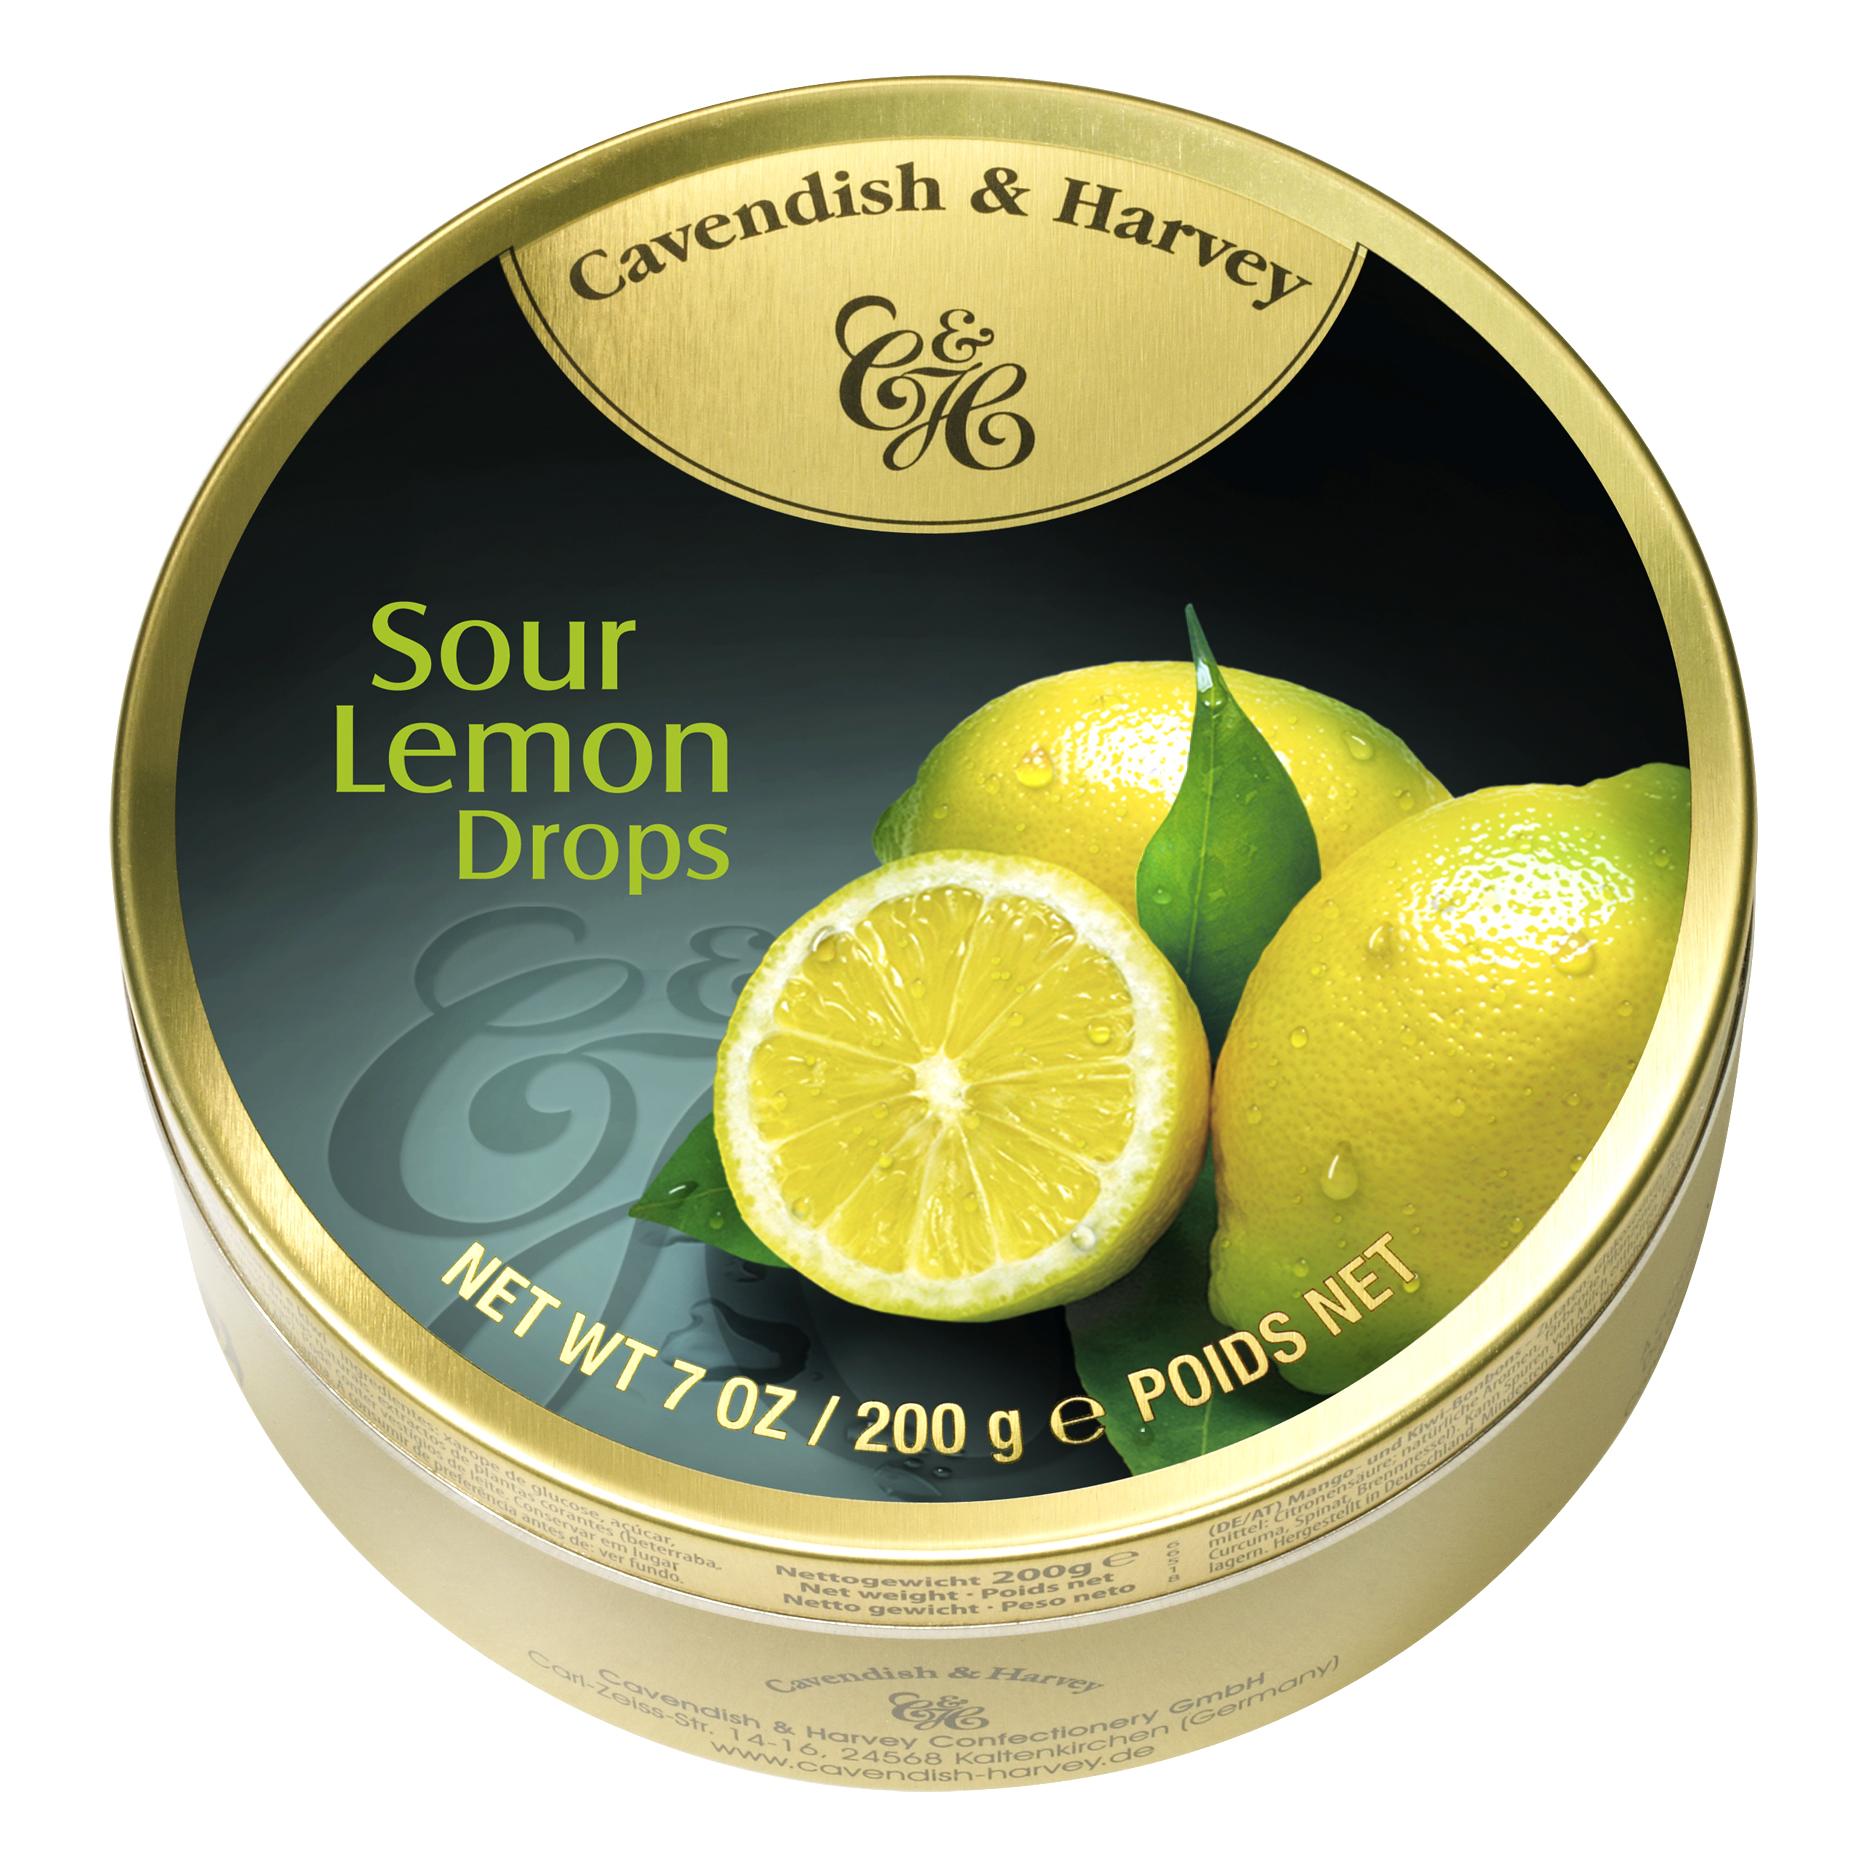 cavendish harvey sour lemon drops 200g online kaufen. Black Bedroom Furniture Sets. Home Design Ideas